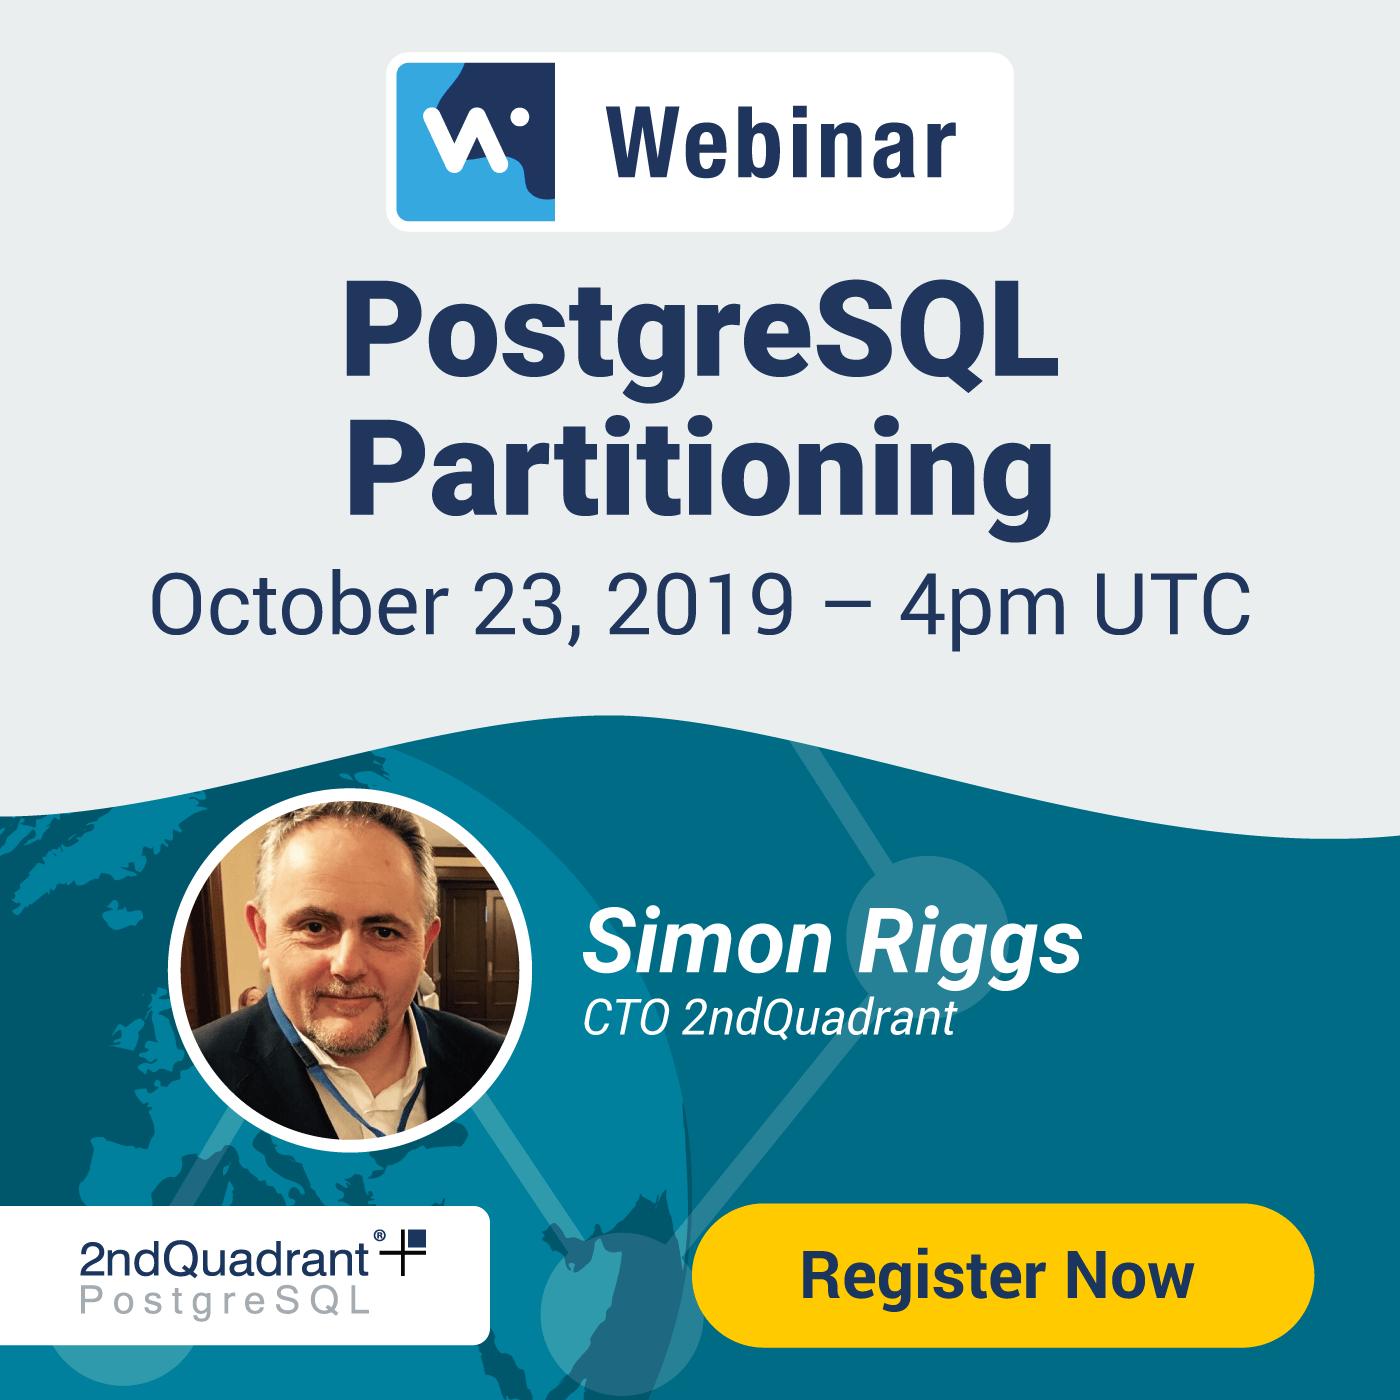 Webinar: PostgreSQL Partitioning